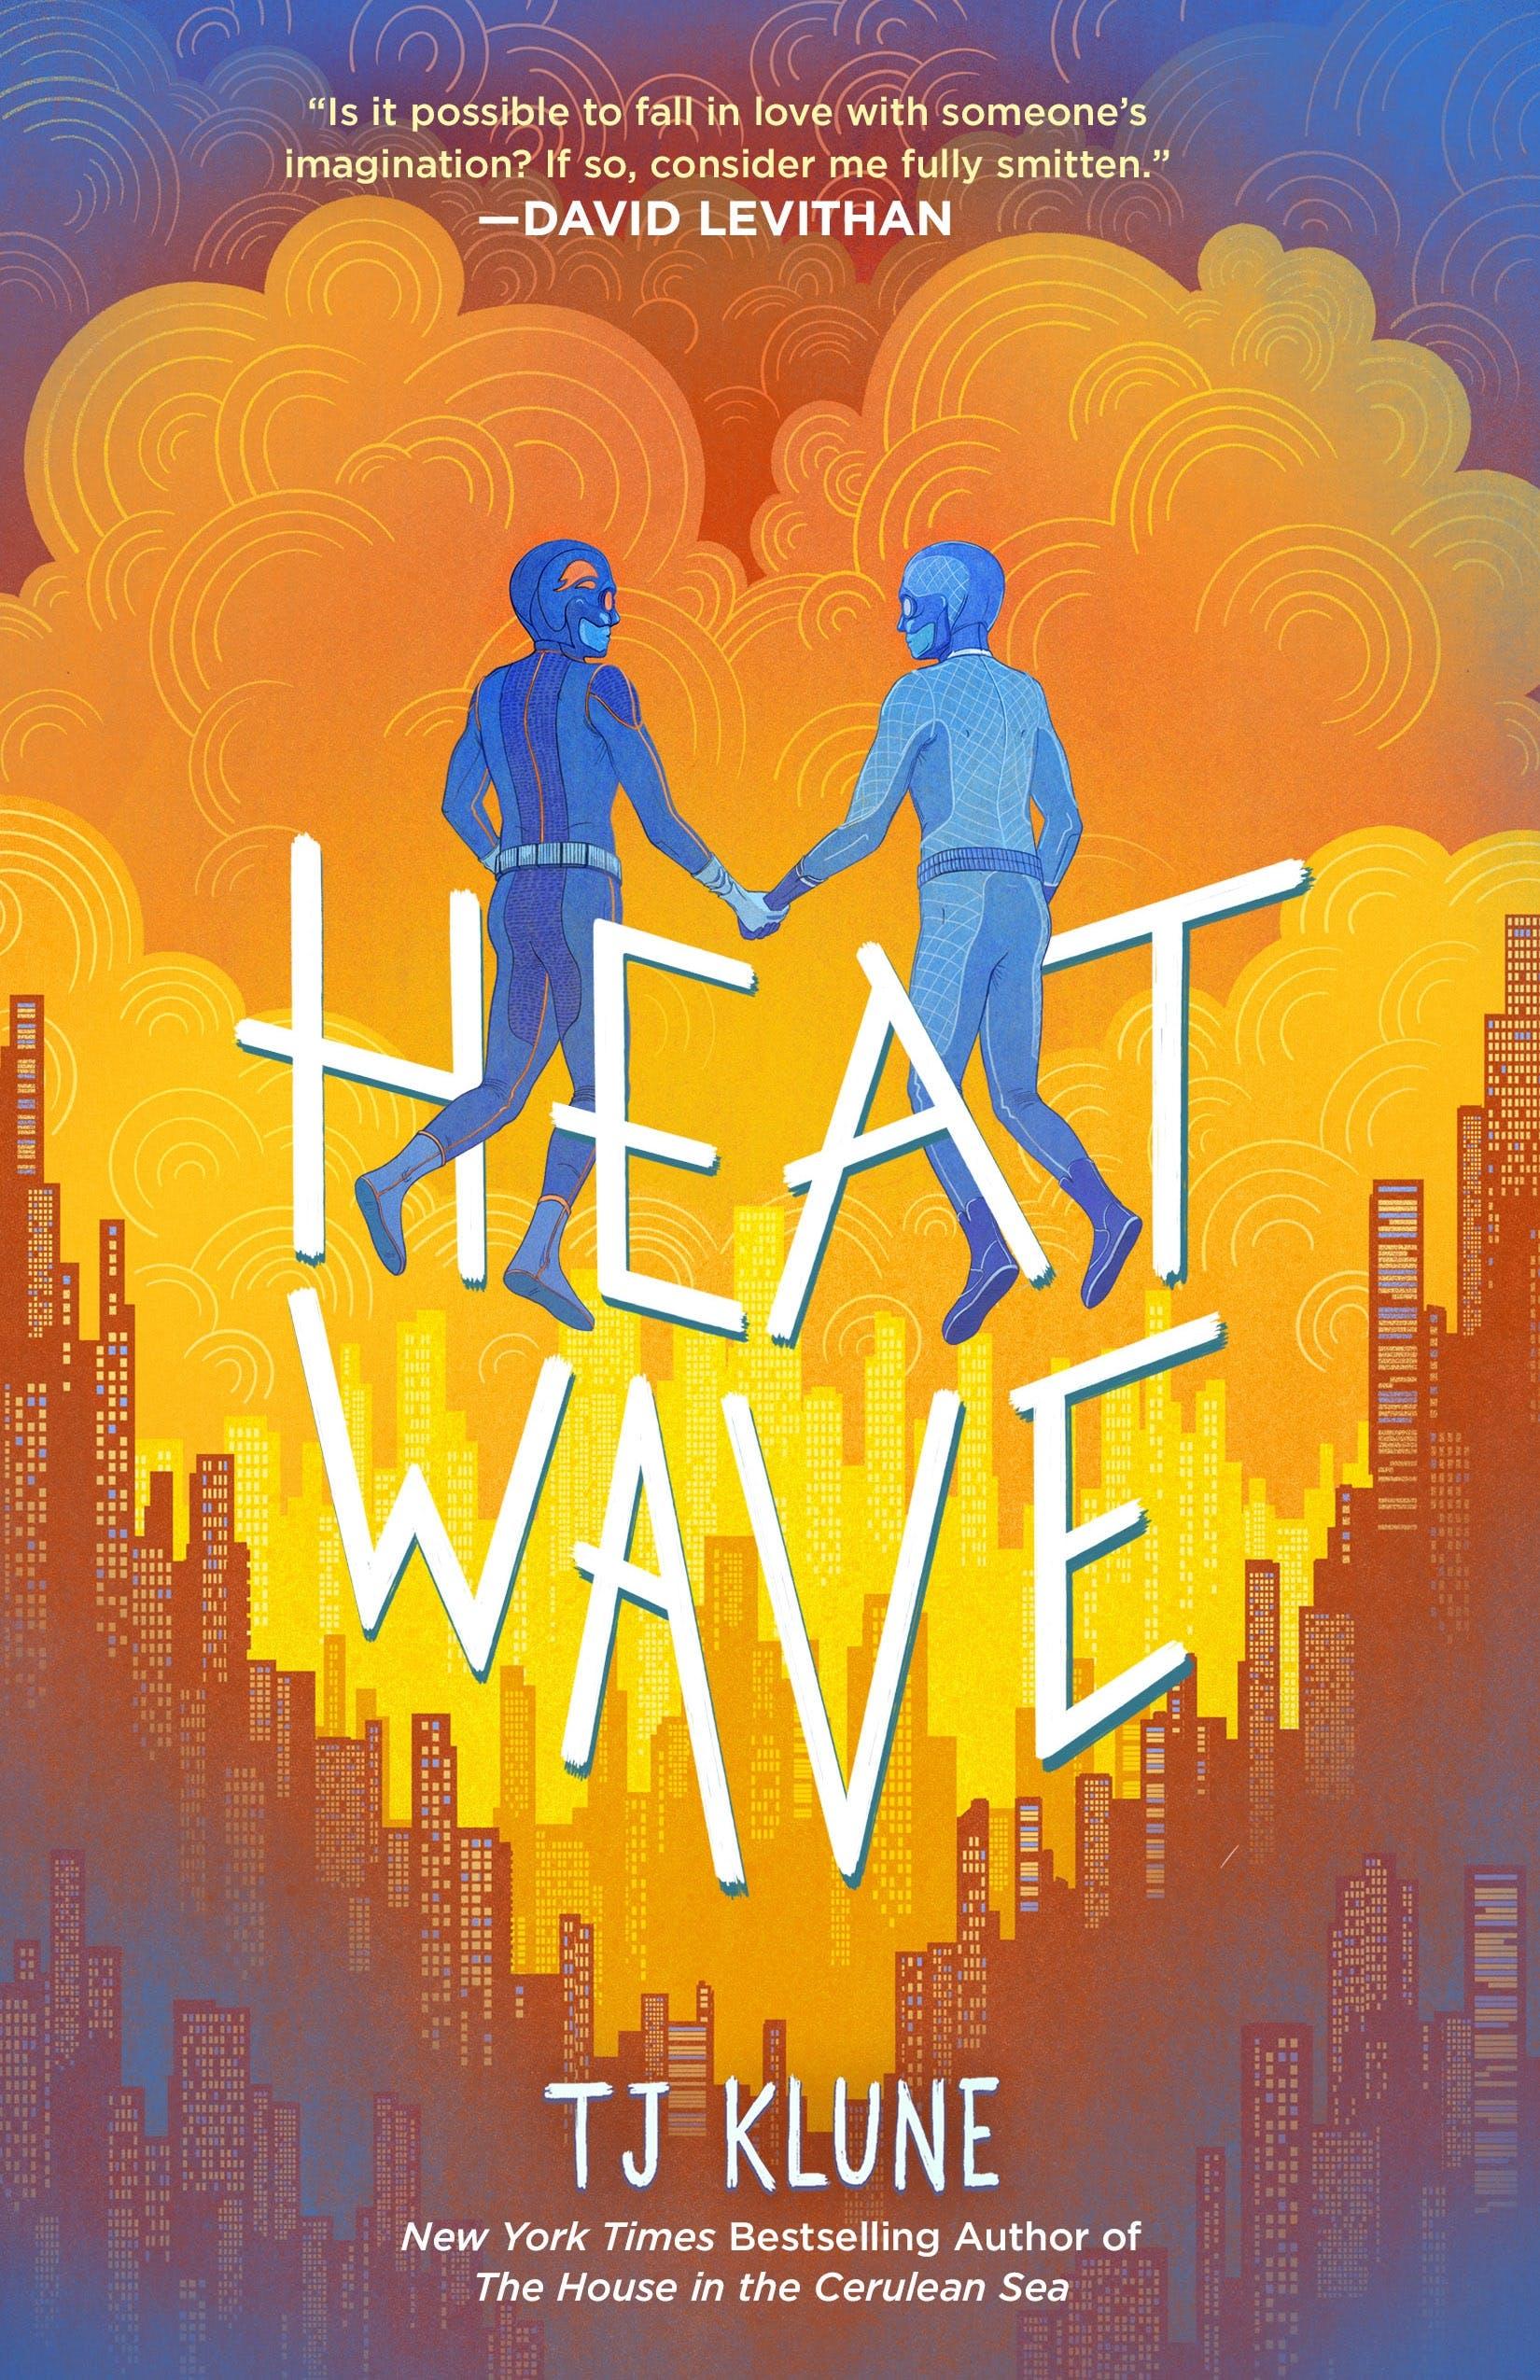 Image of Heat Wave